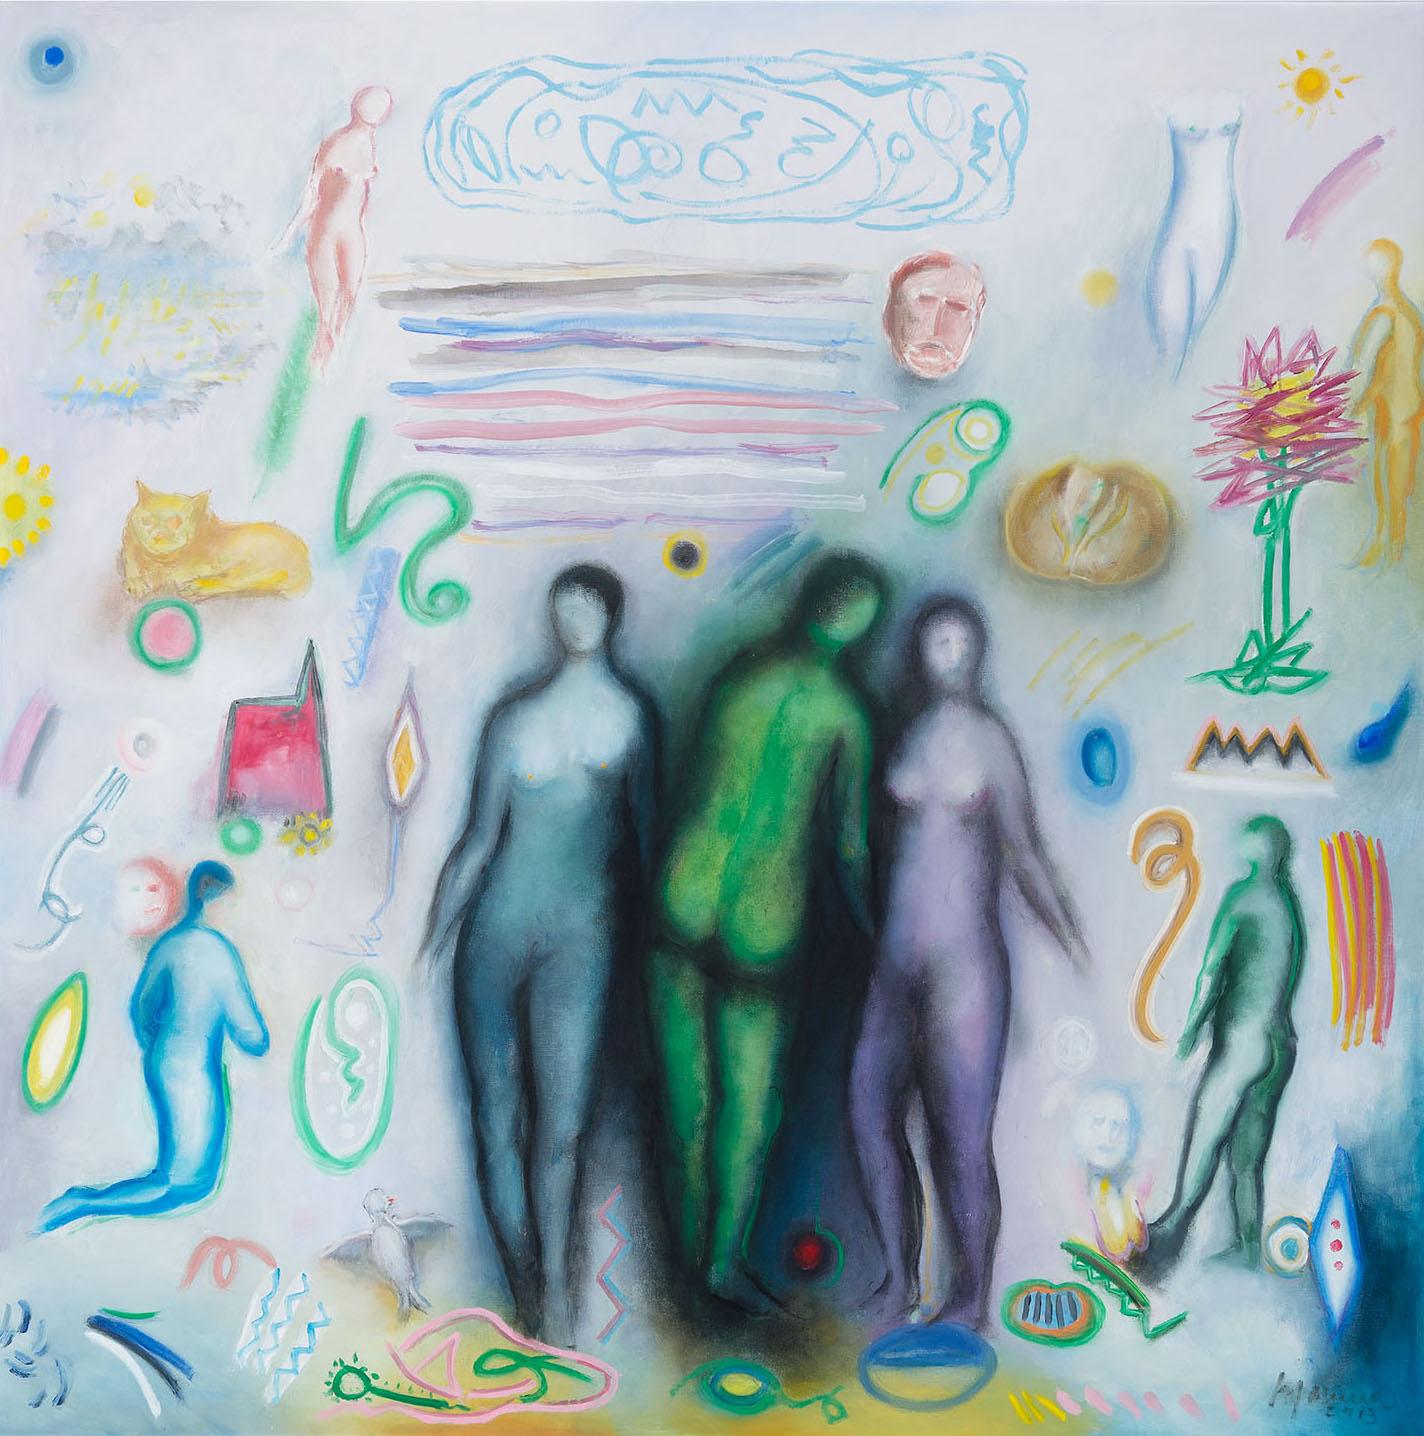 Daydream, 2013, oil on canvas, cm 125 x 125